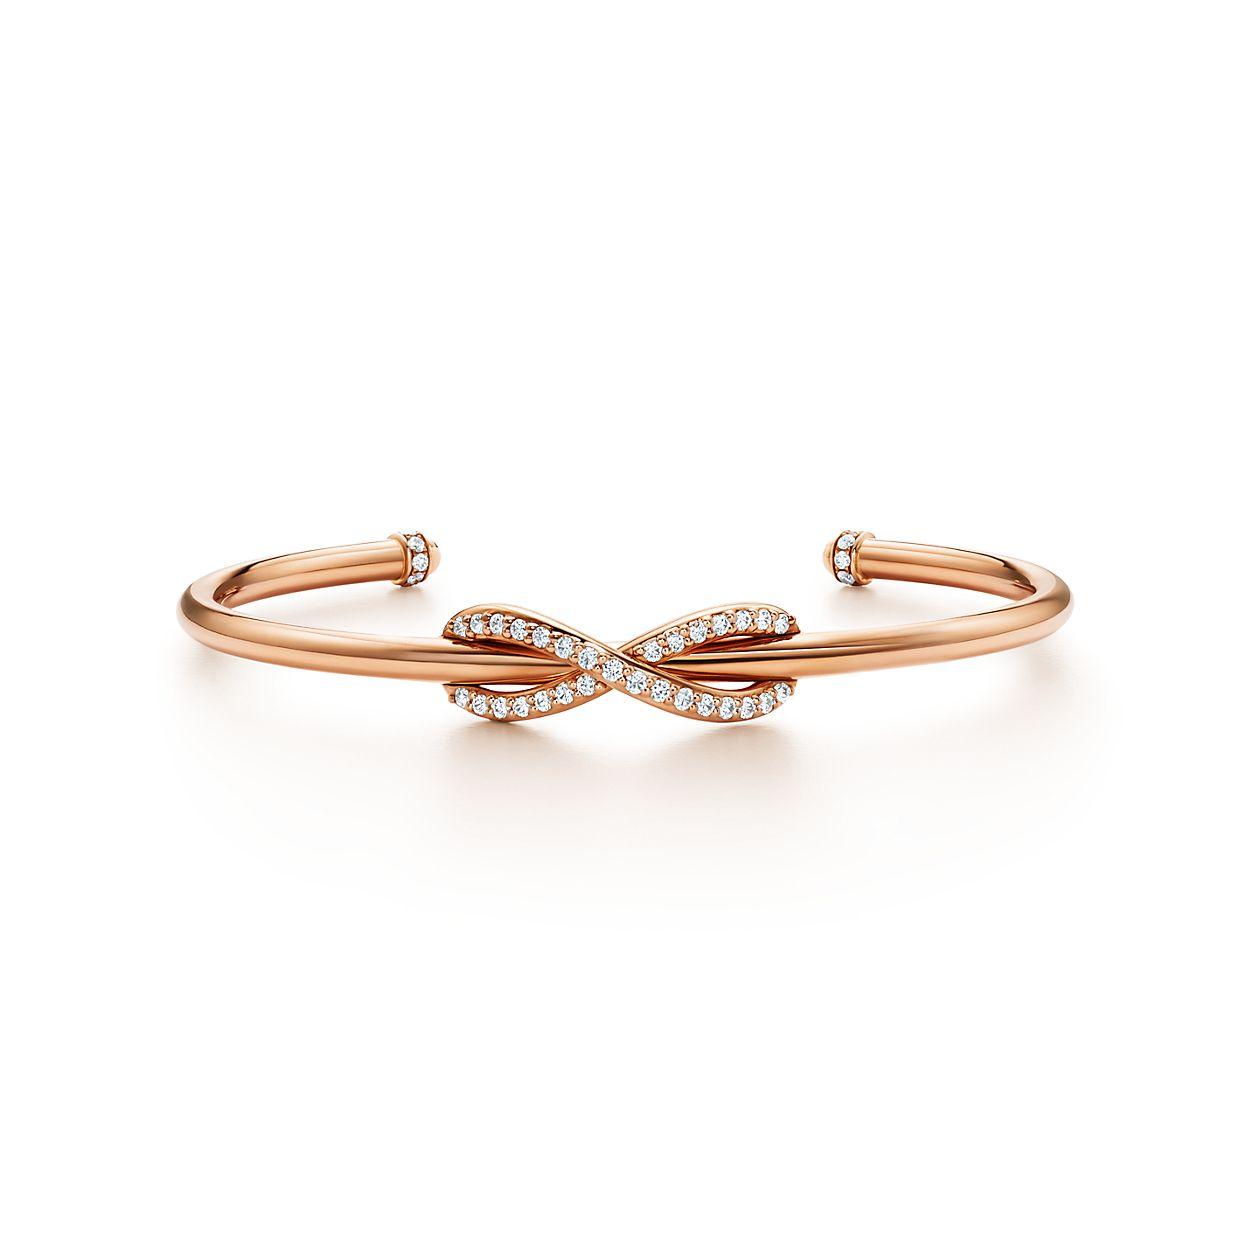 Boucles D'oreilles À L'infini Tiffany En Or Rose 18 Carats Tiffany & Co. DRqqnUJE